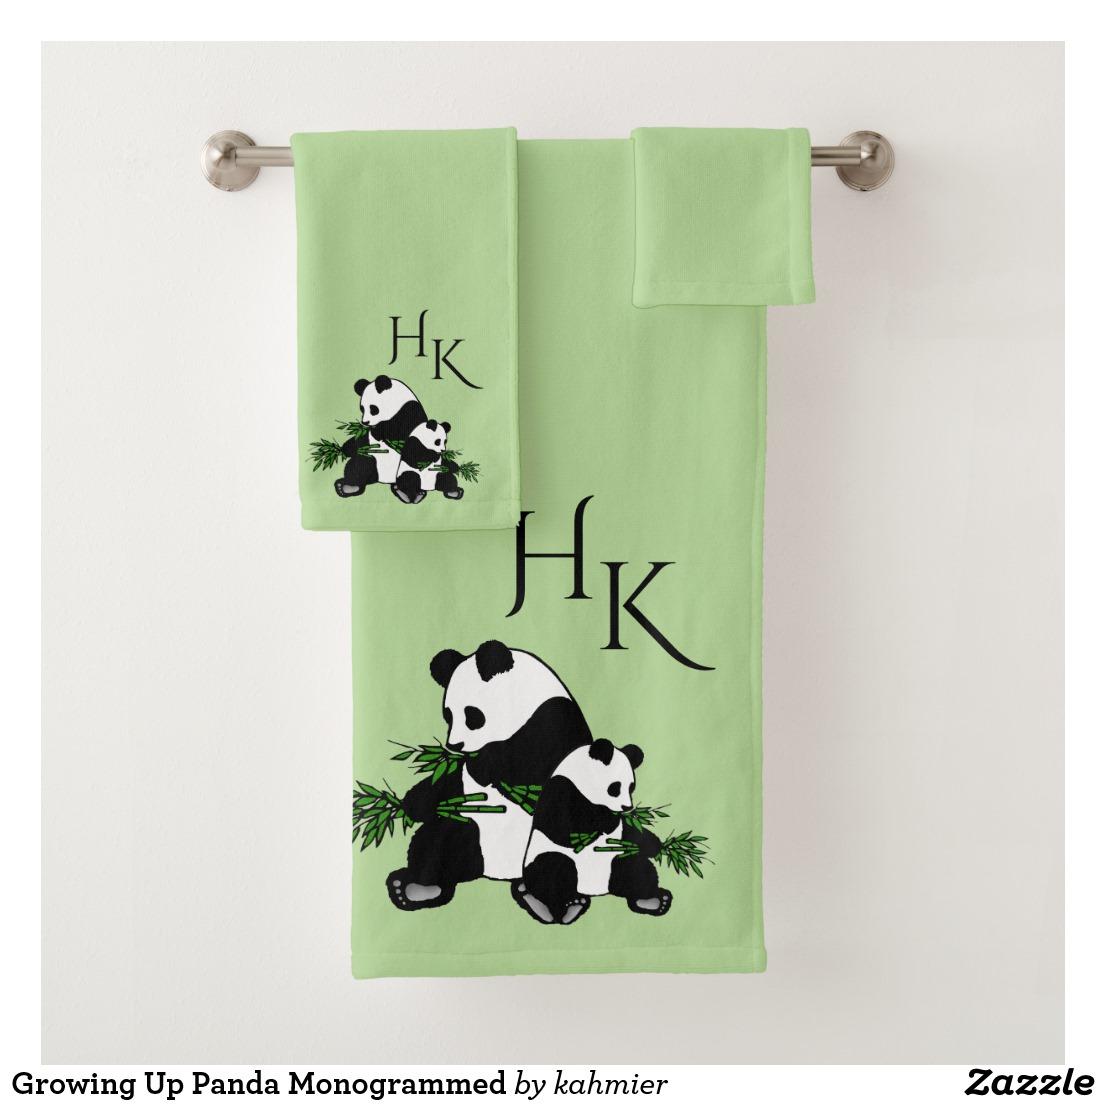 Growing Up Panda Monogrammed Bath Towel Set